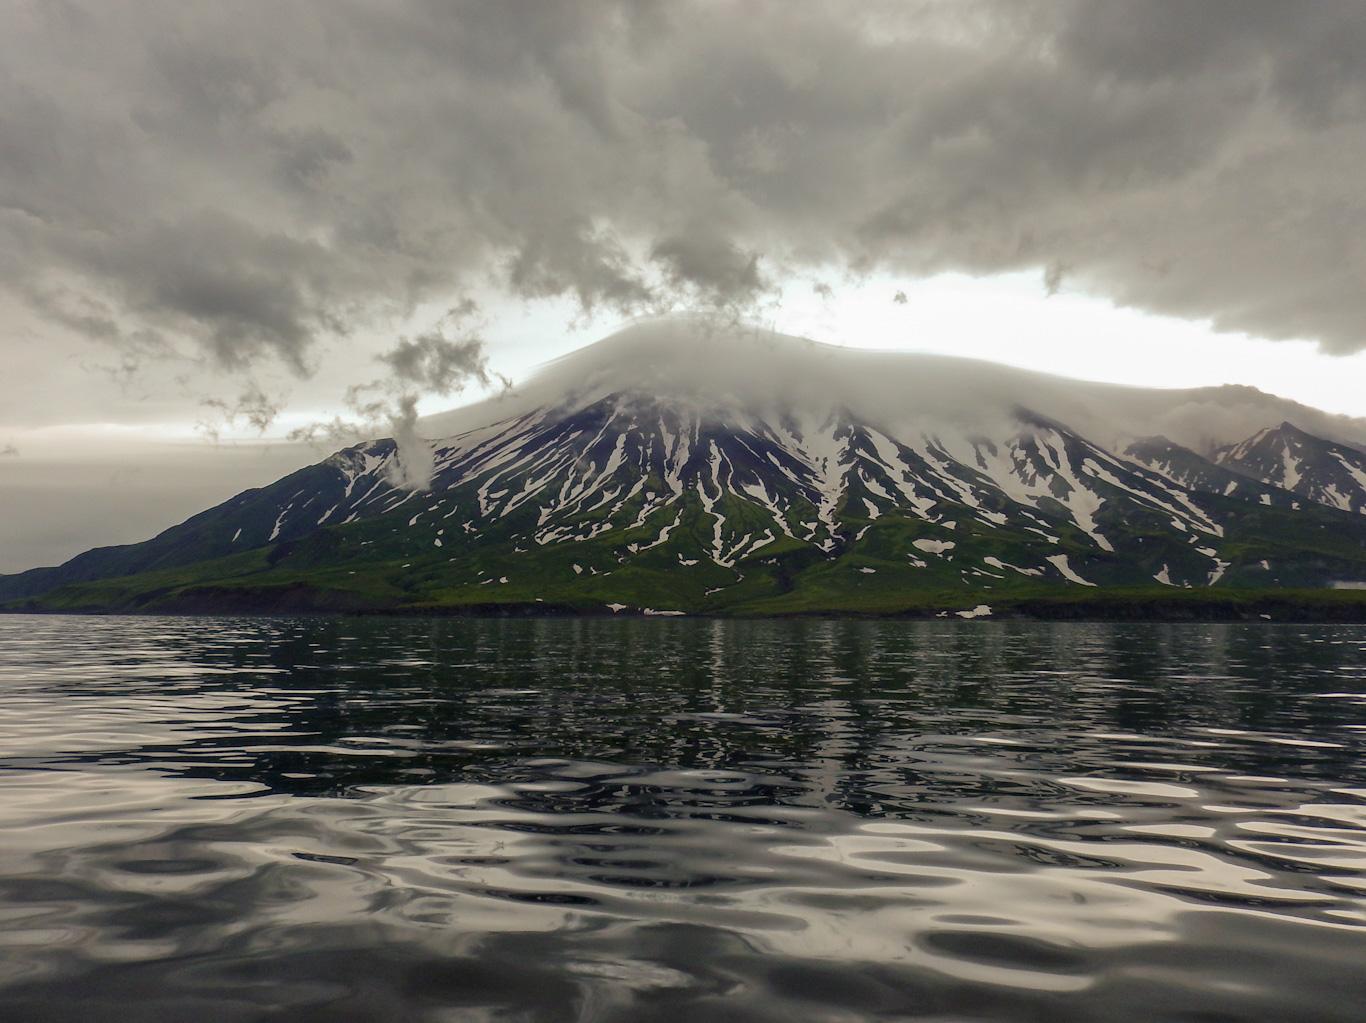 Вулкан Чикурачки, Парамушир